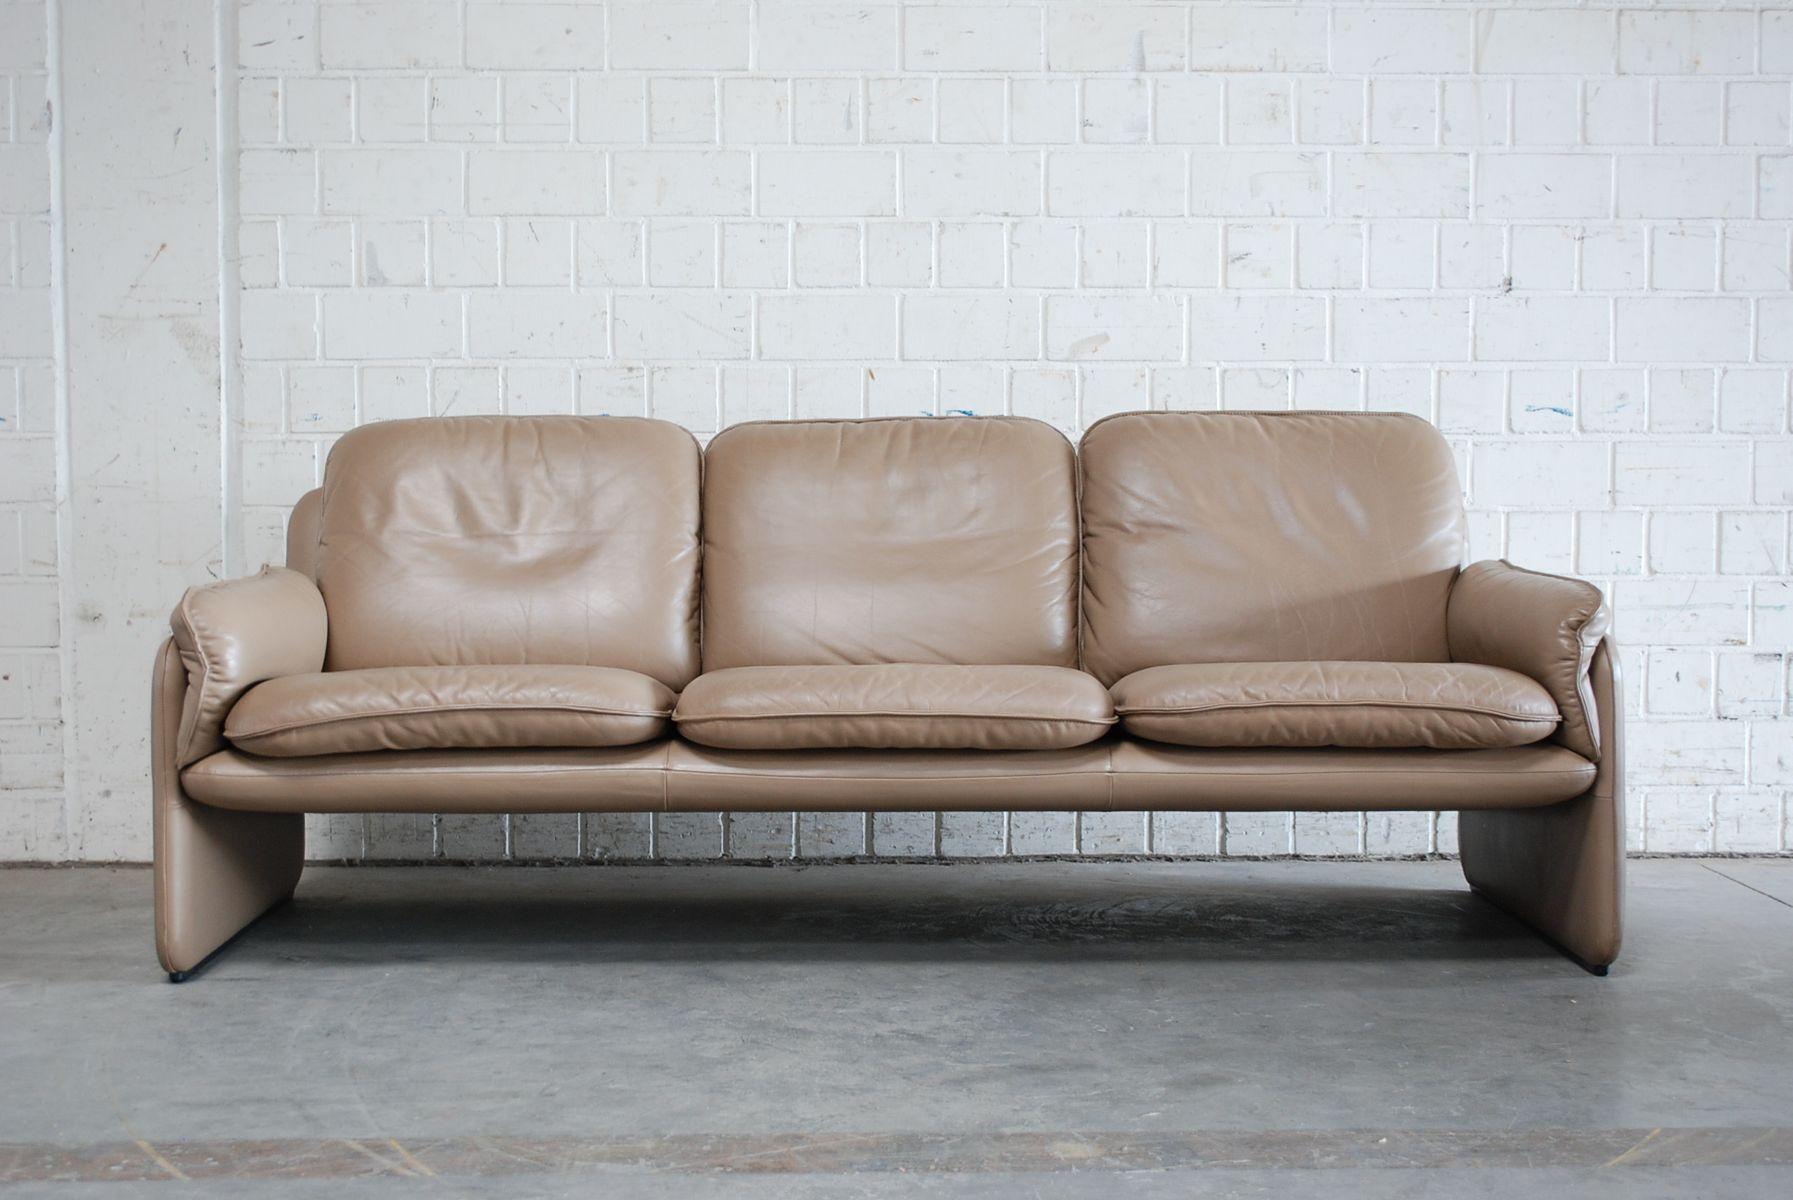 de sede sofa sofa series ds 102 by de sede thesofa. Black Bedroom Furniture Sets. Home Design Ideas